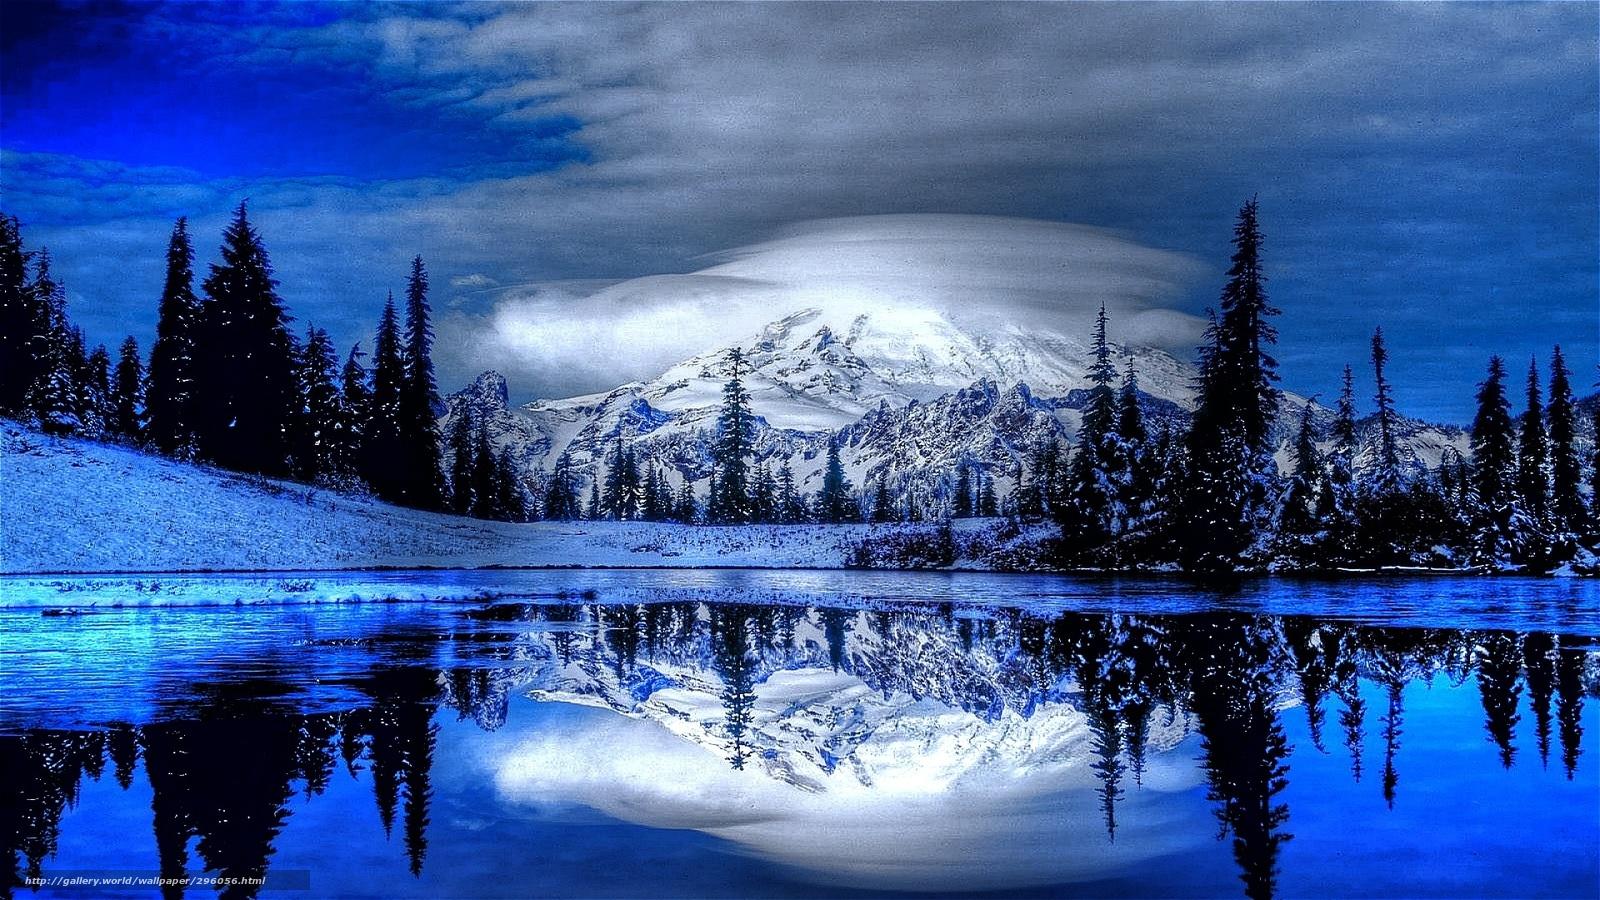 Download wallpaper nature mountains water forest free for Sfondi gratis desktop inverno